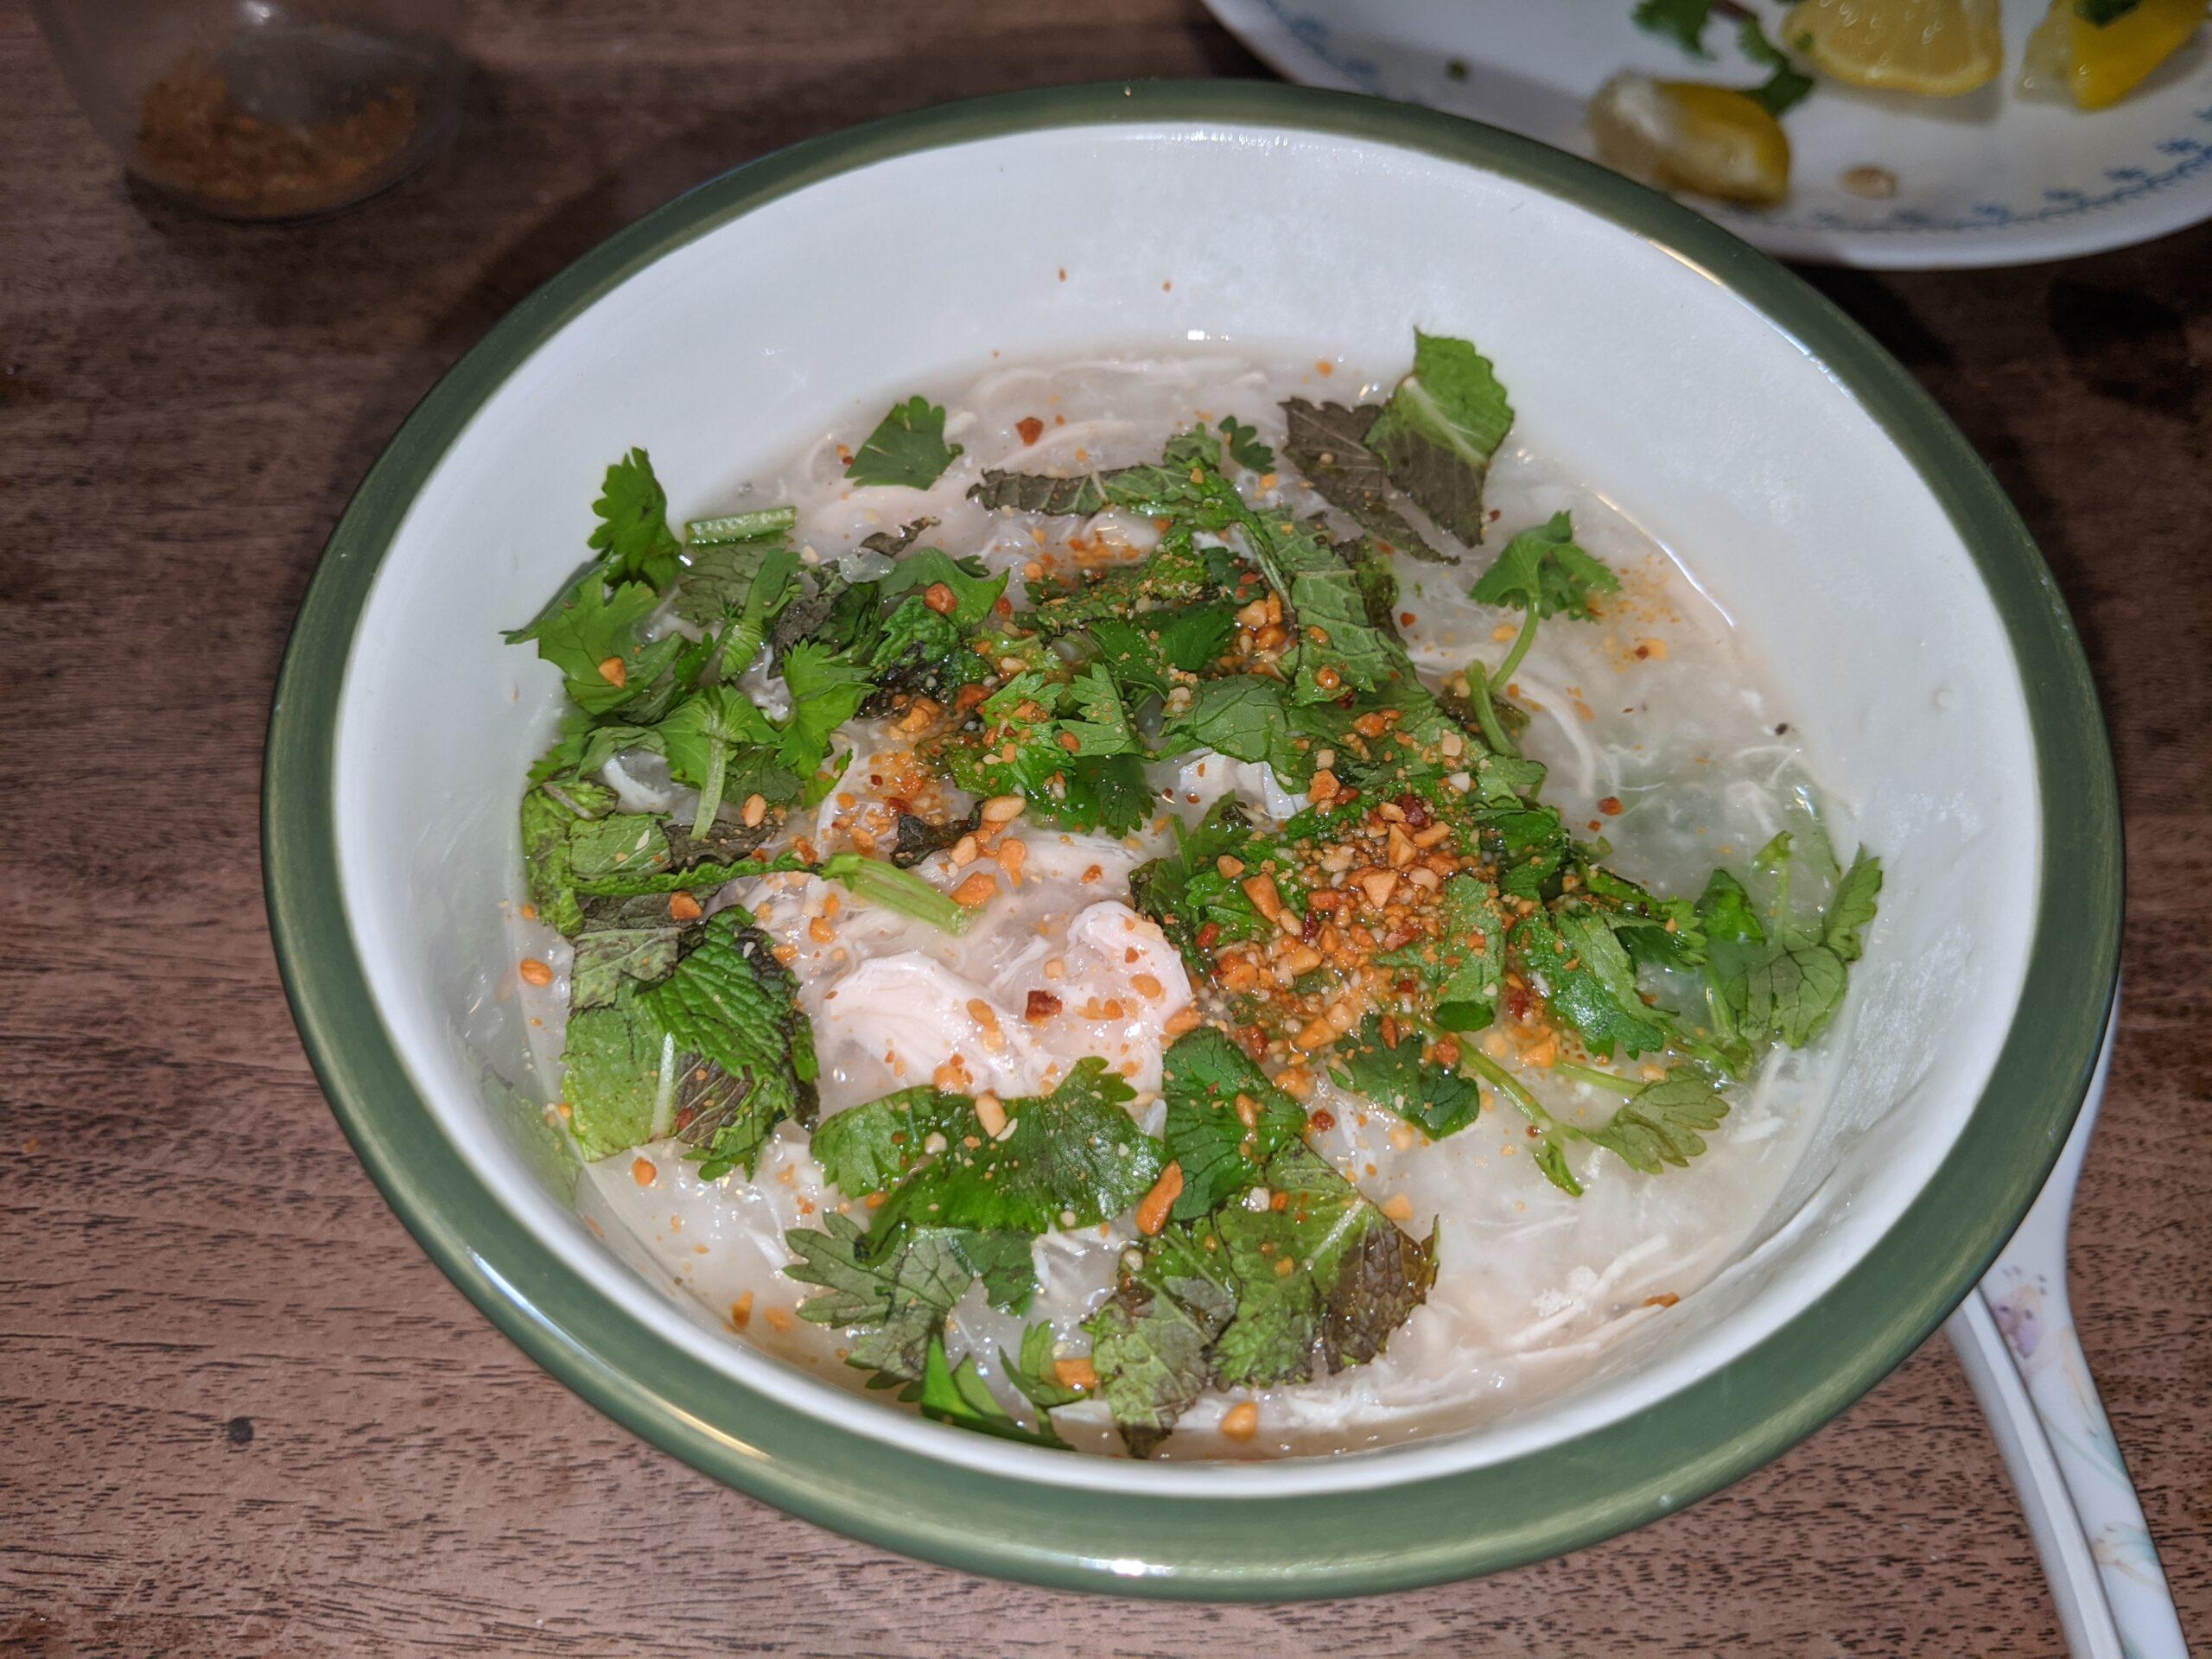 Chao Ga - rice porridge